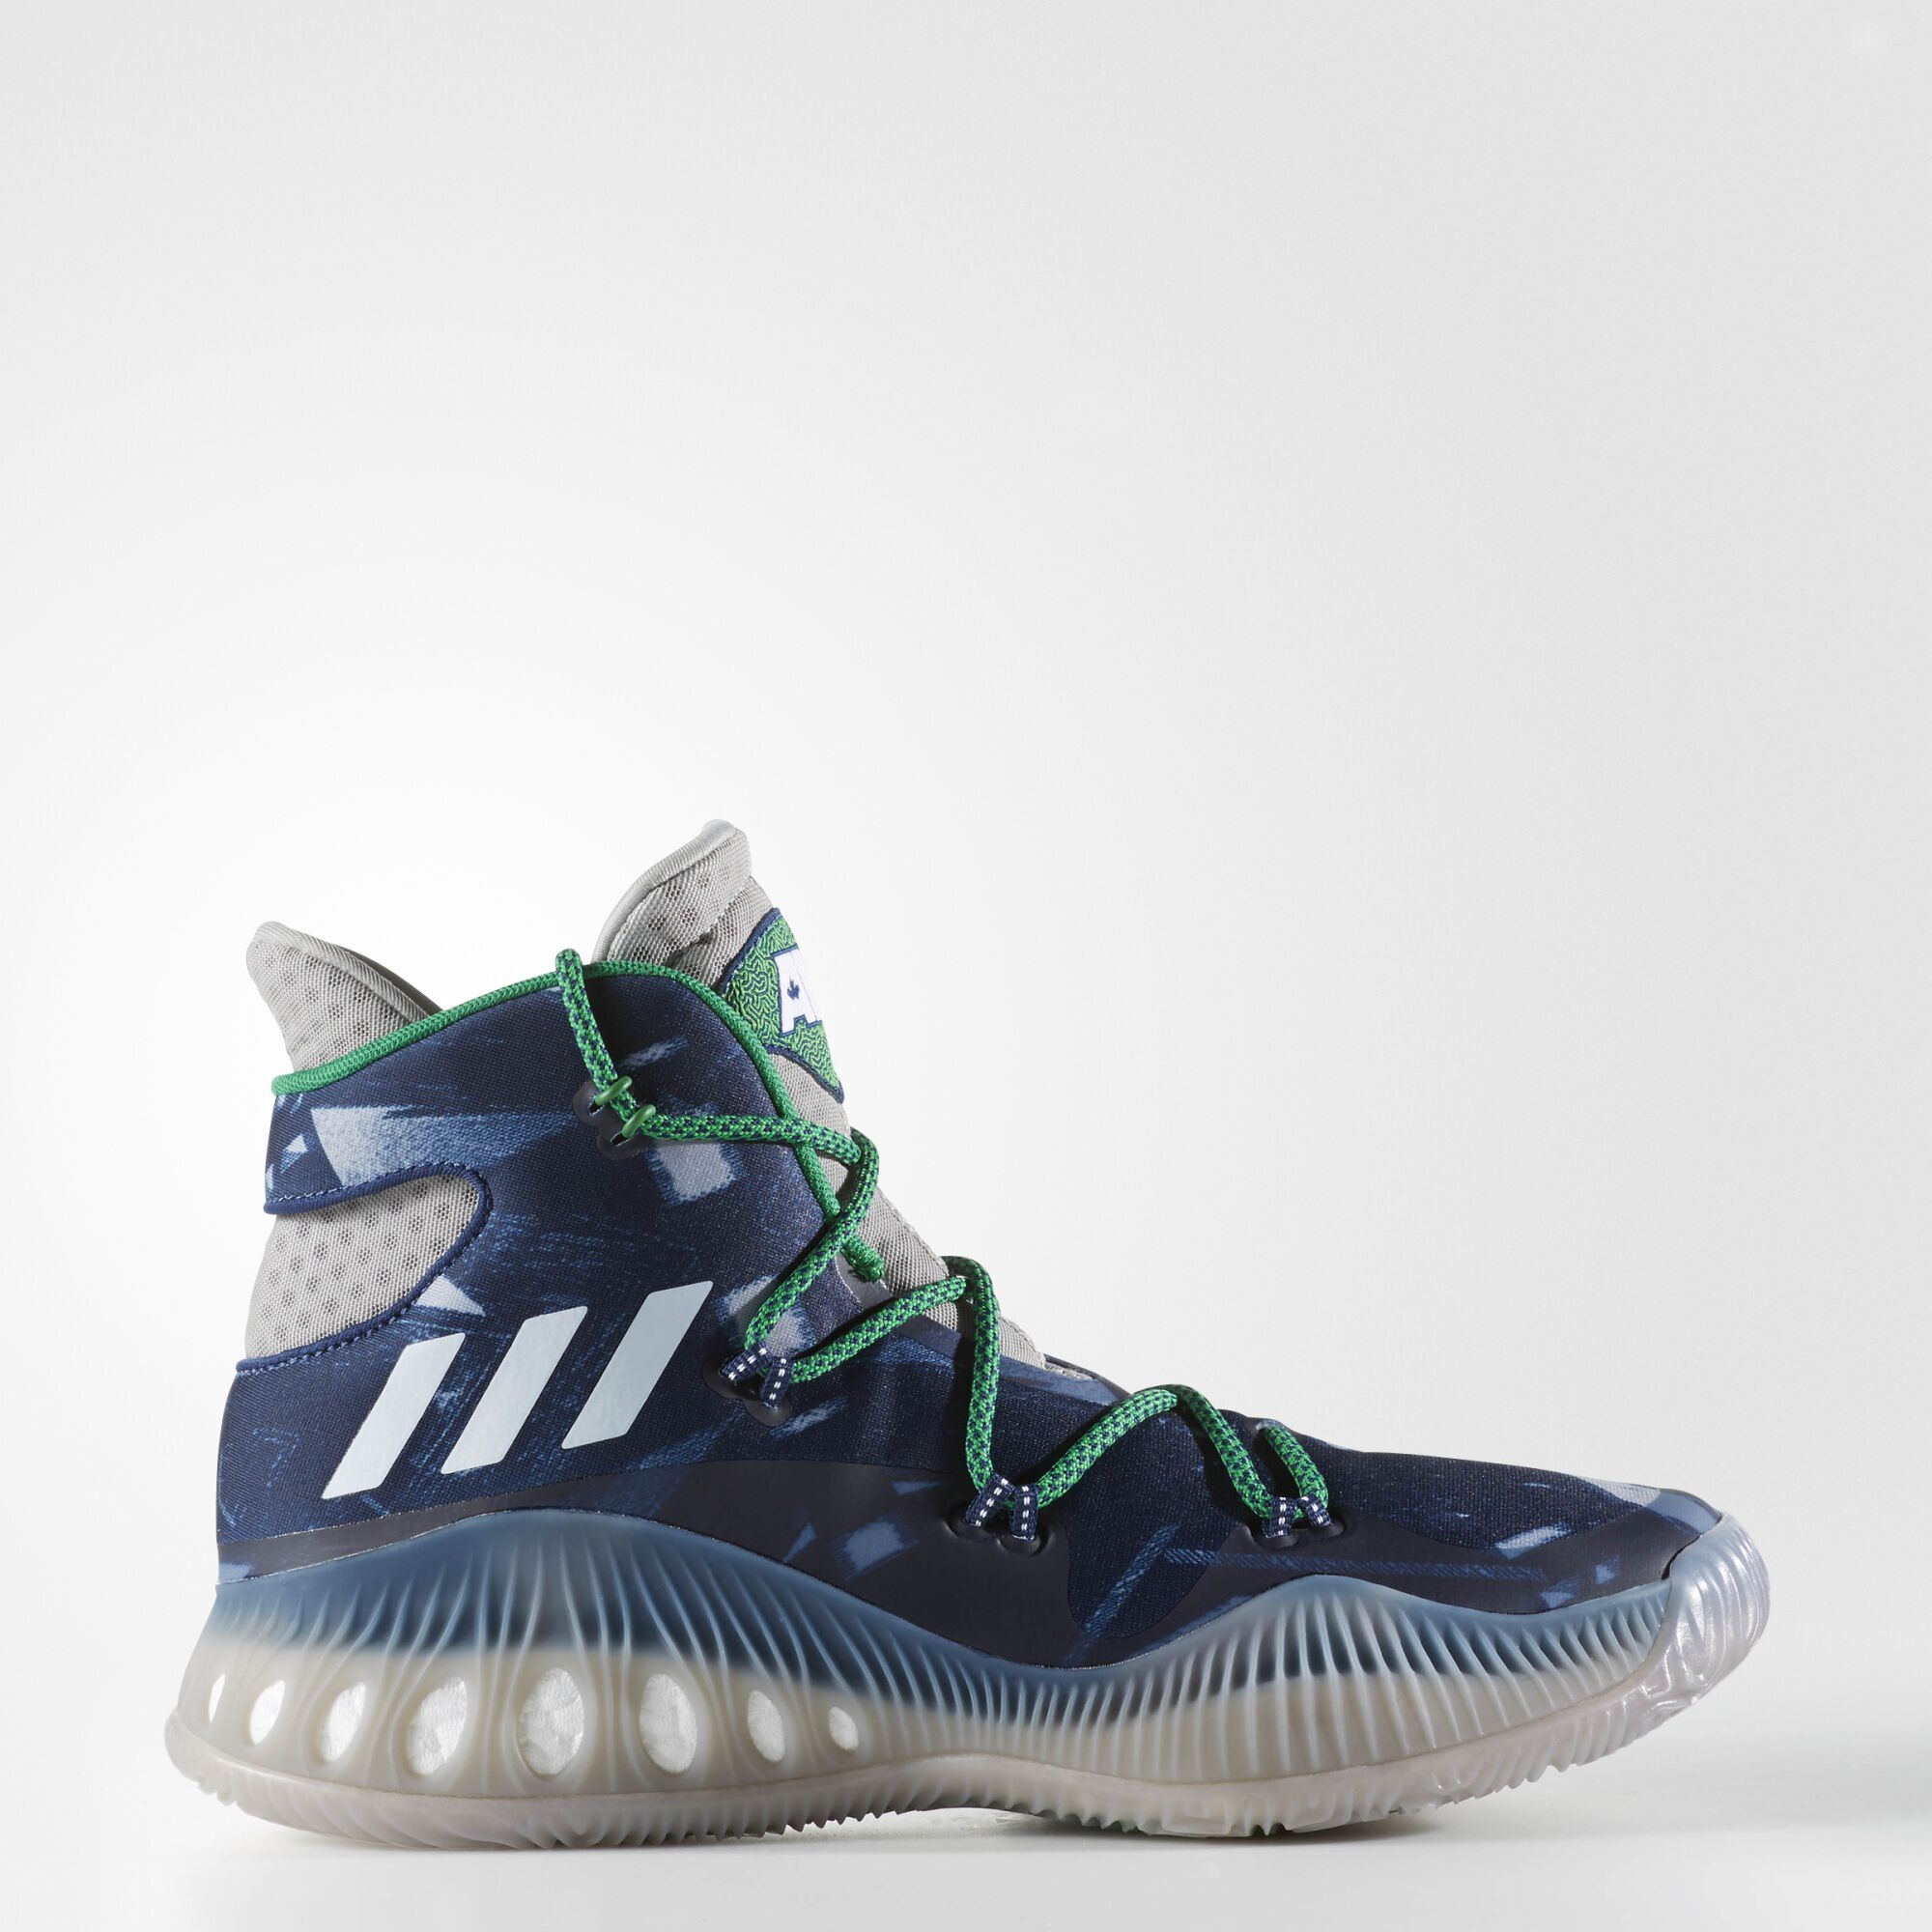 adidas dragon dark blue,adidas samba light blue > OFF49